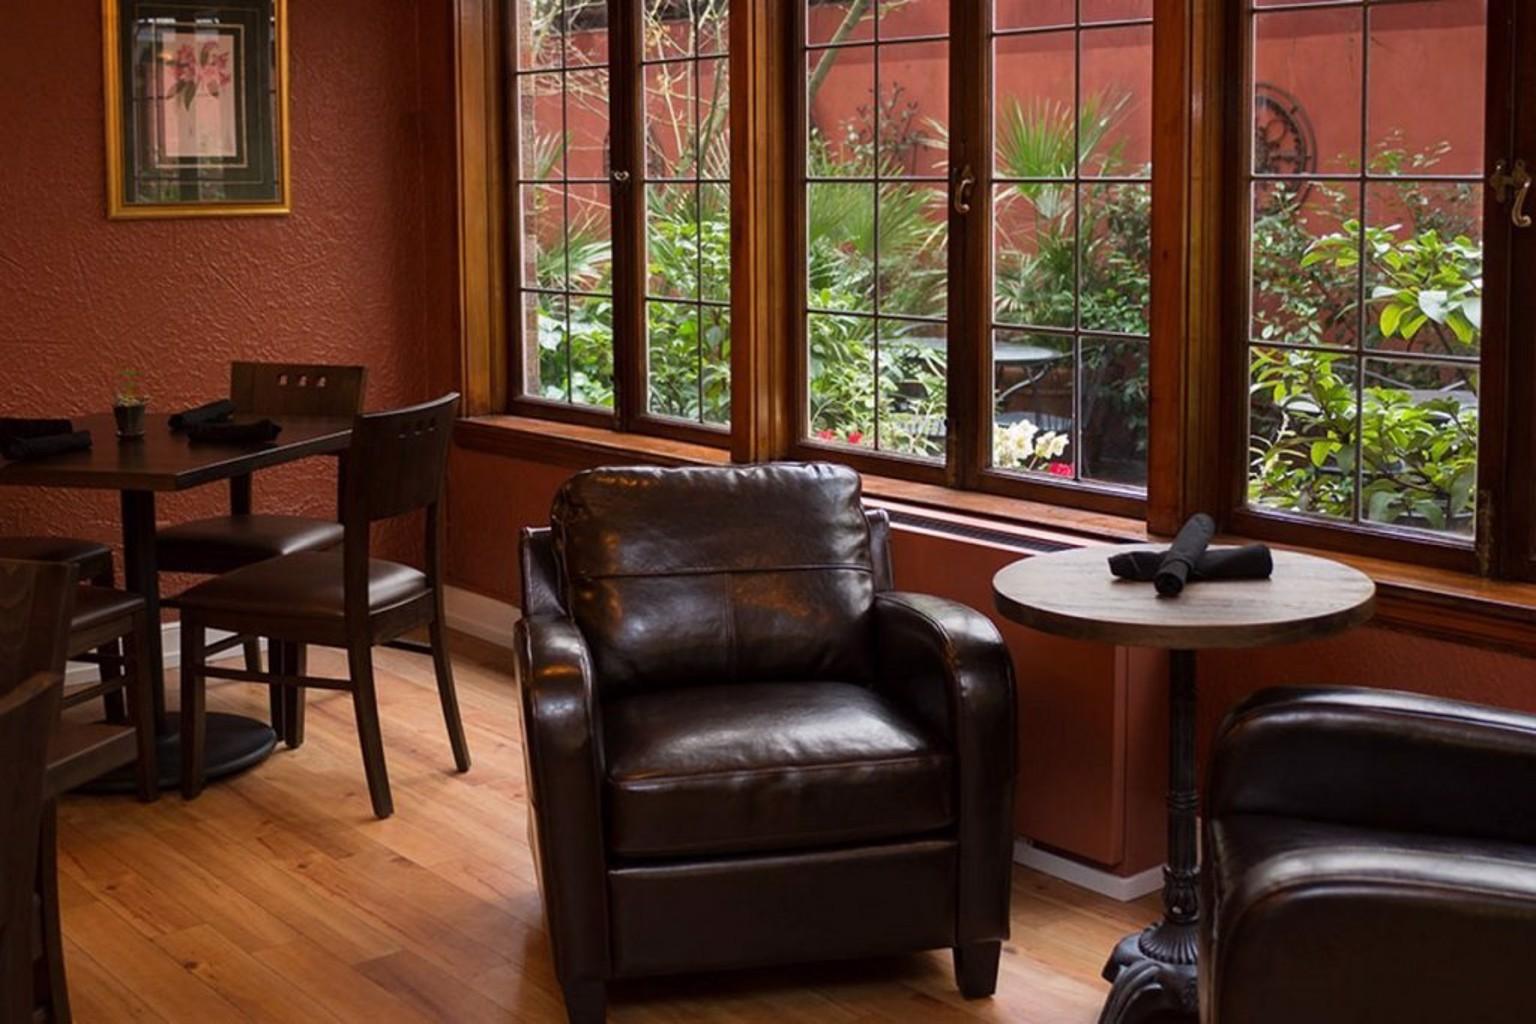 Gallery image of The Inn at Virginia Mason